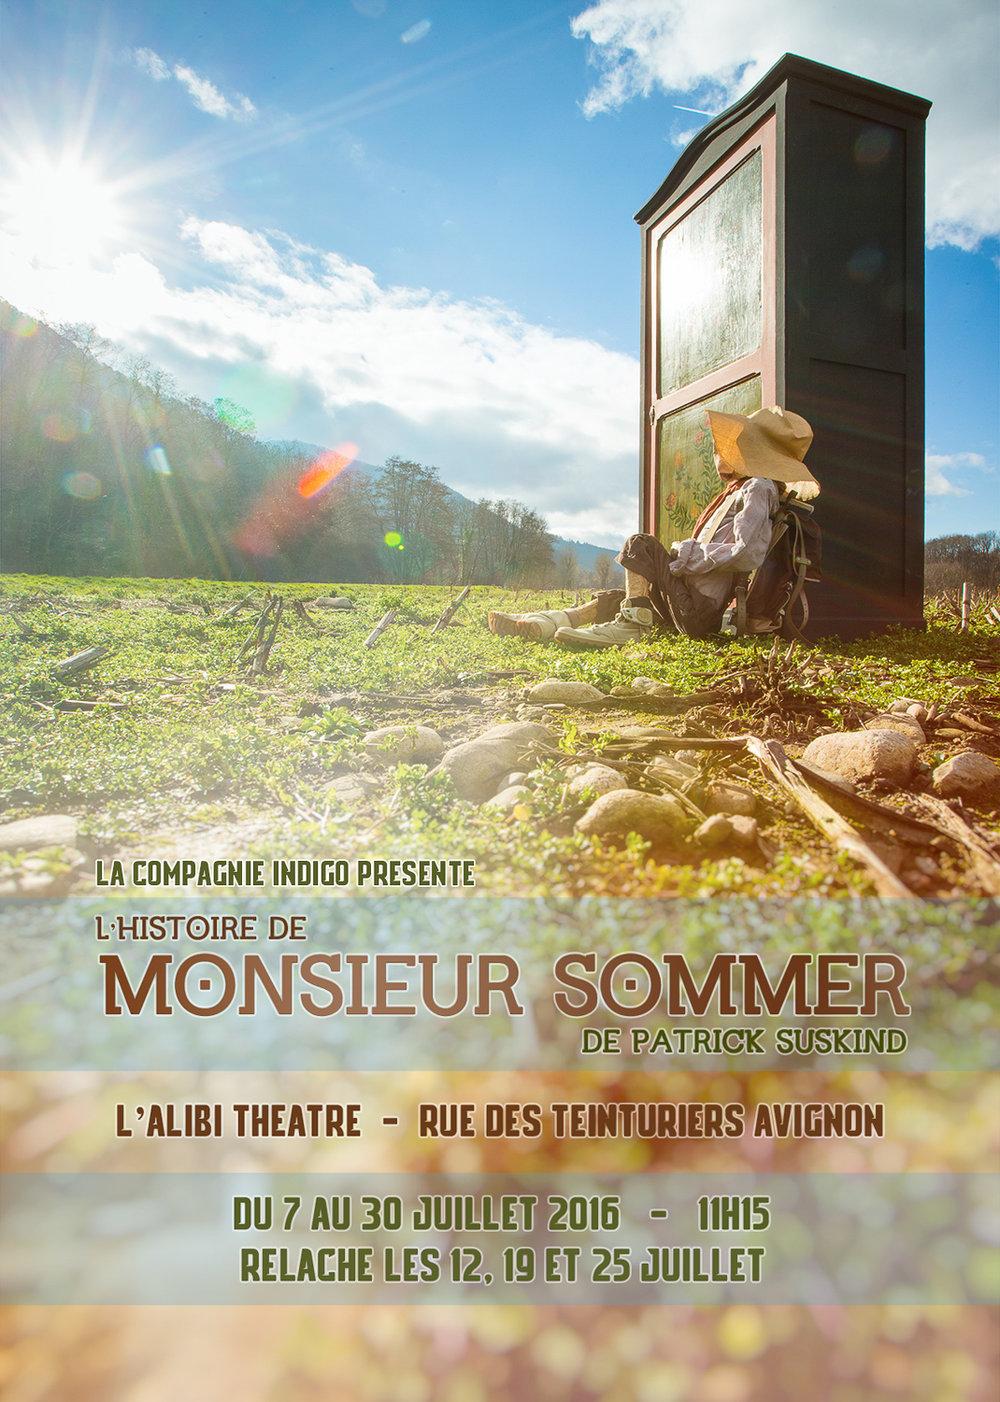 Cie Indigo - L'histoire de Monsieur Sommer - 2016